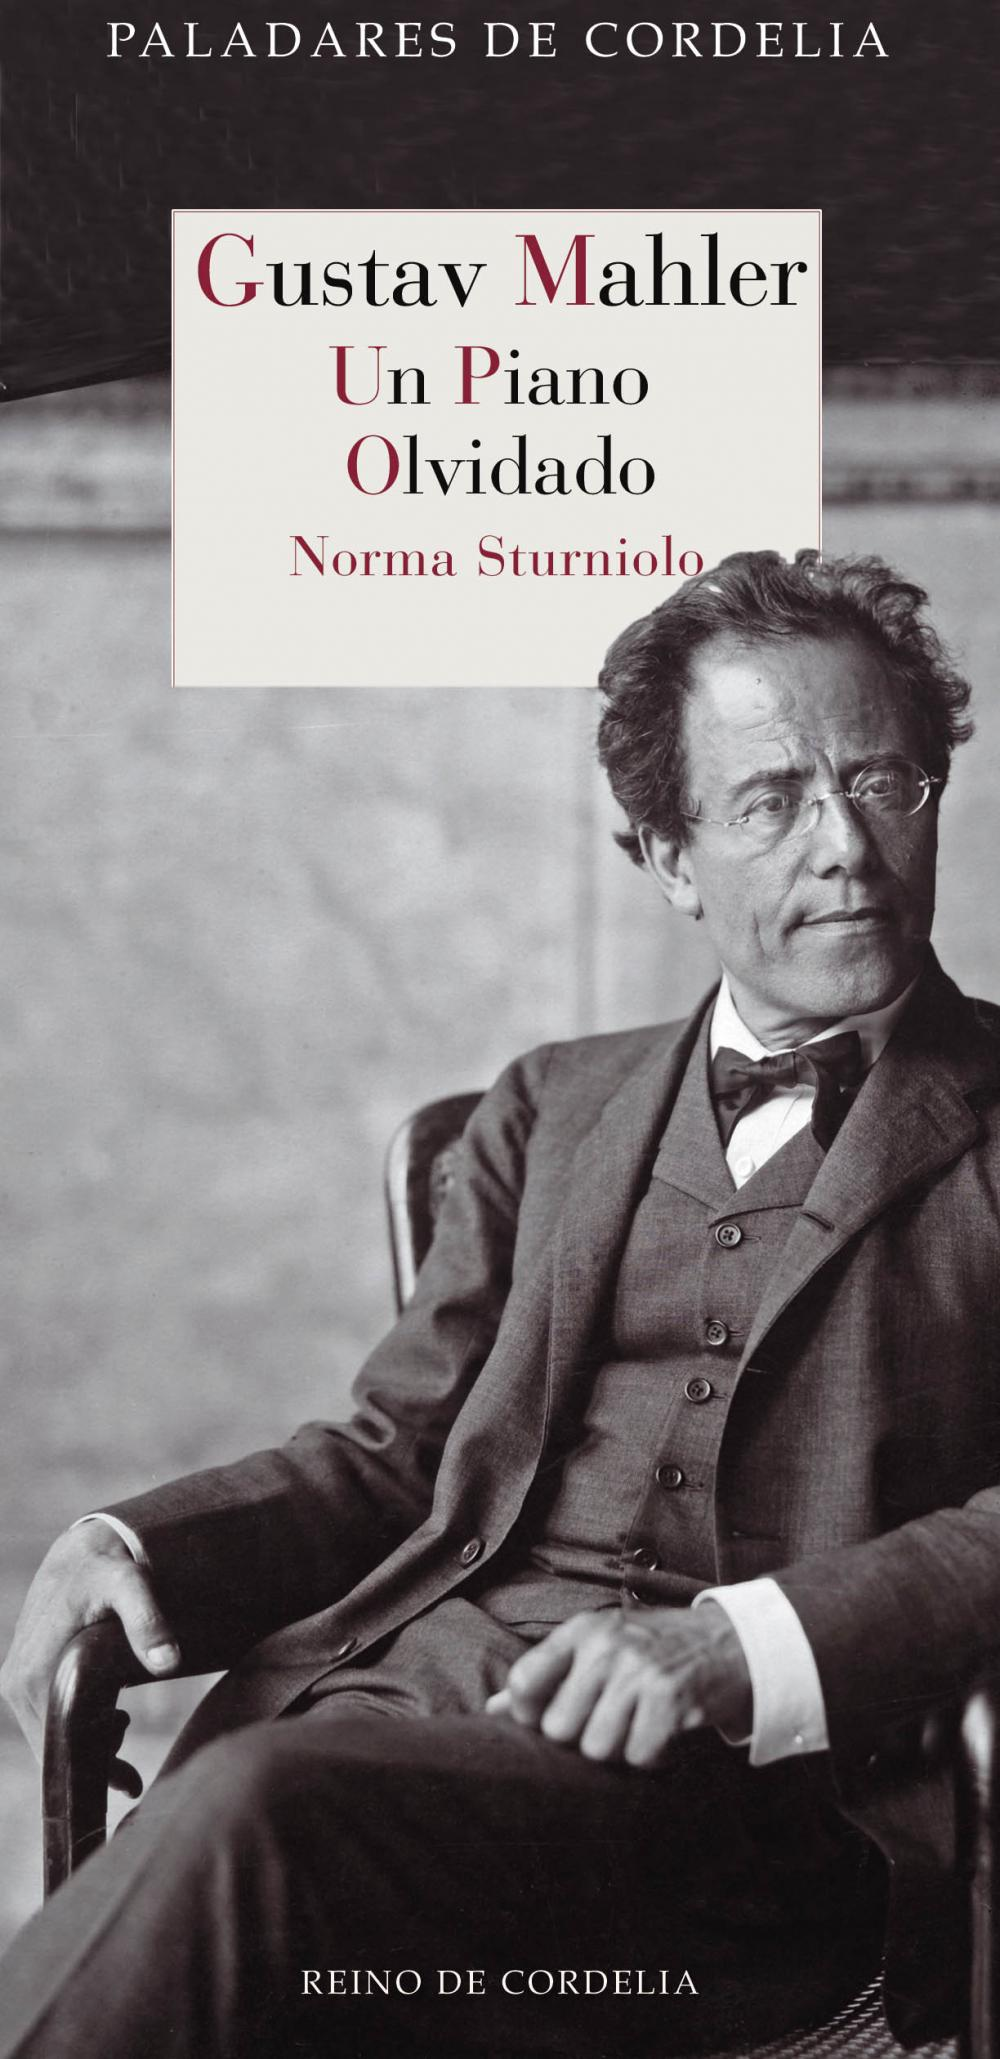 Gustav Mahler. Un piano olvidado